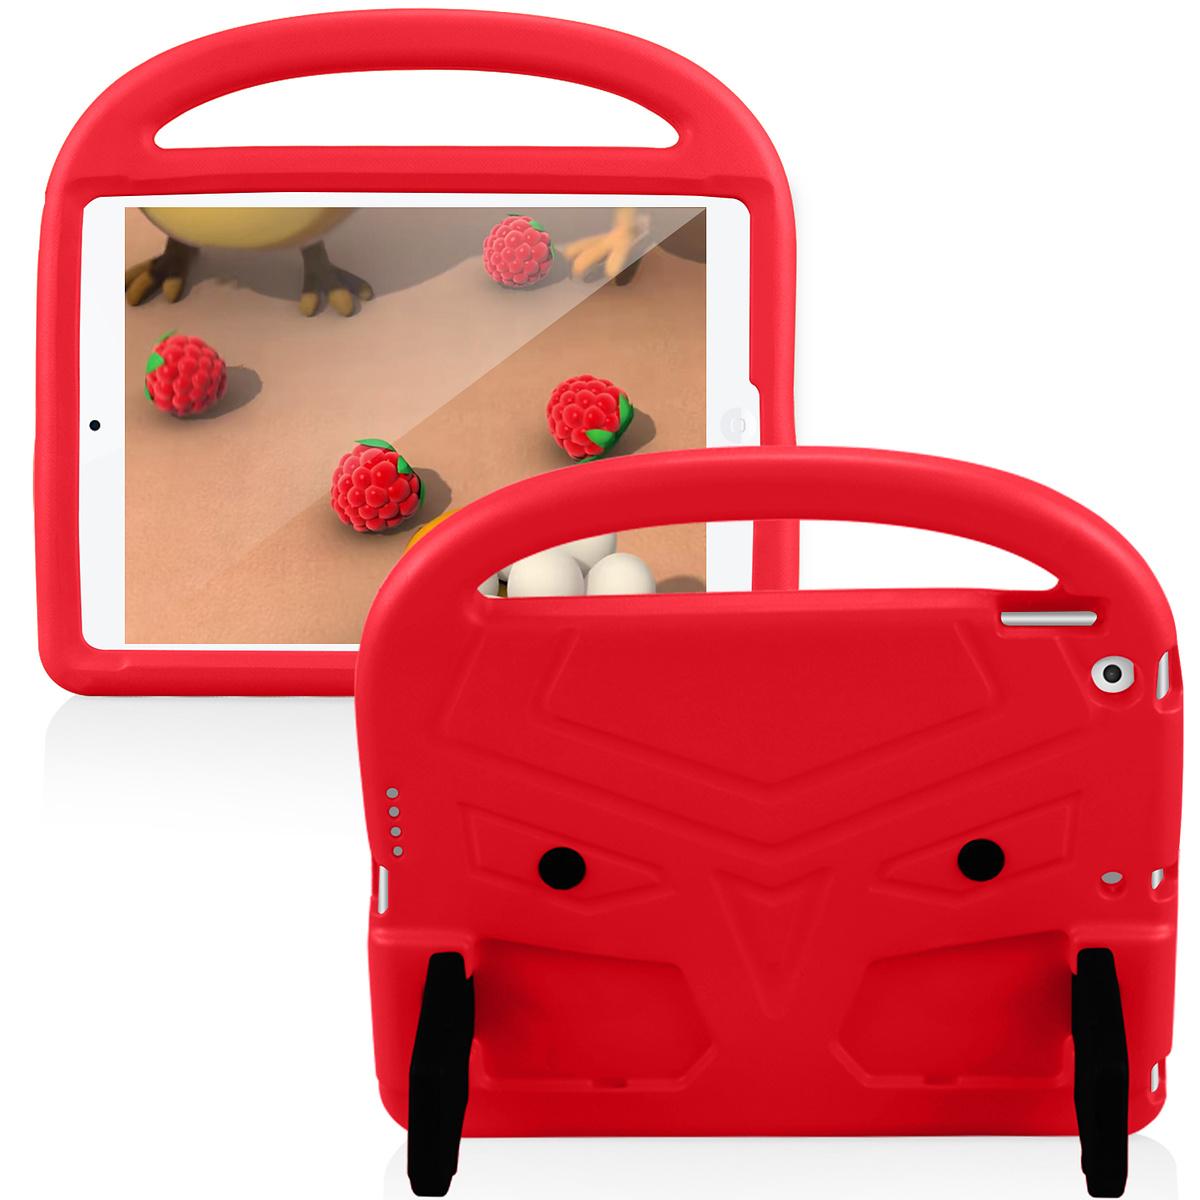 Barnfodral med ställ, iPad 10.2 / Pro 10.5 / iPad Air 3, röd